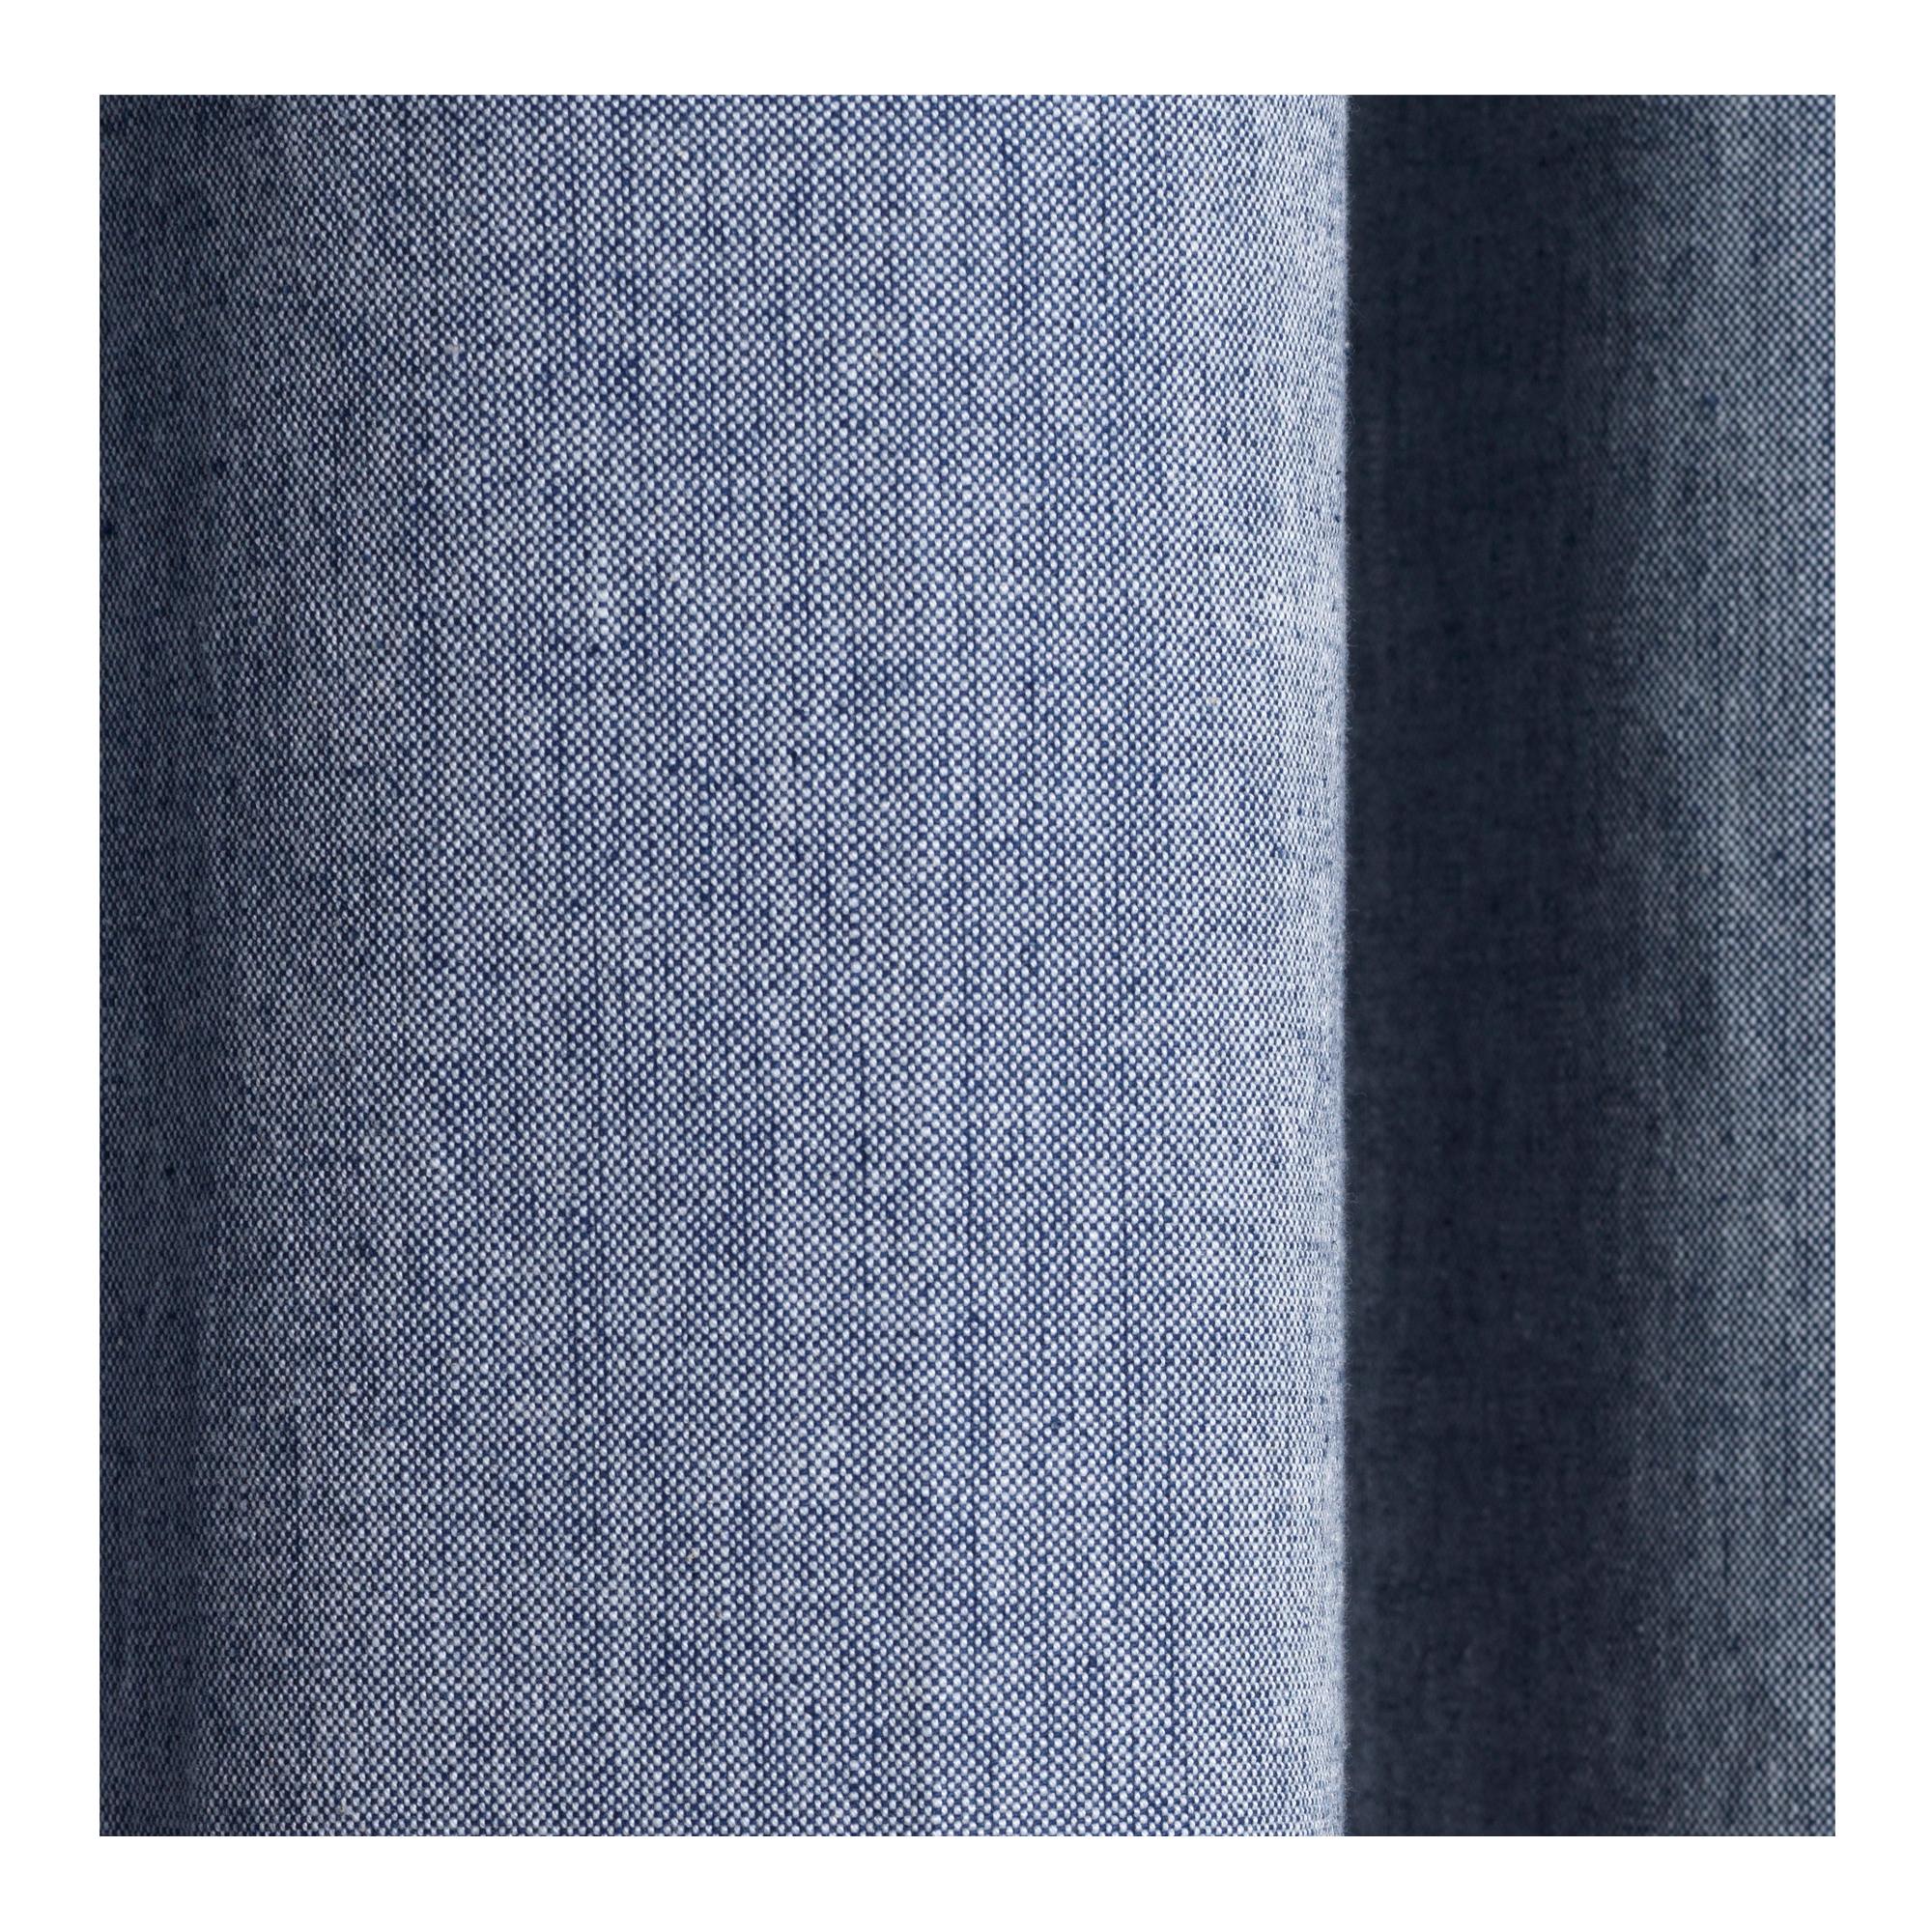 Chambray Shower Curtain Blue. Duschdraperi. utförande c968c19ab1f1a